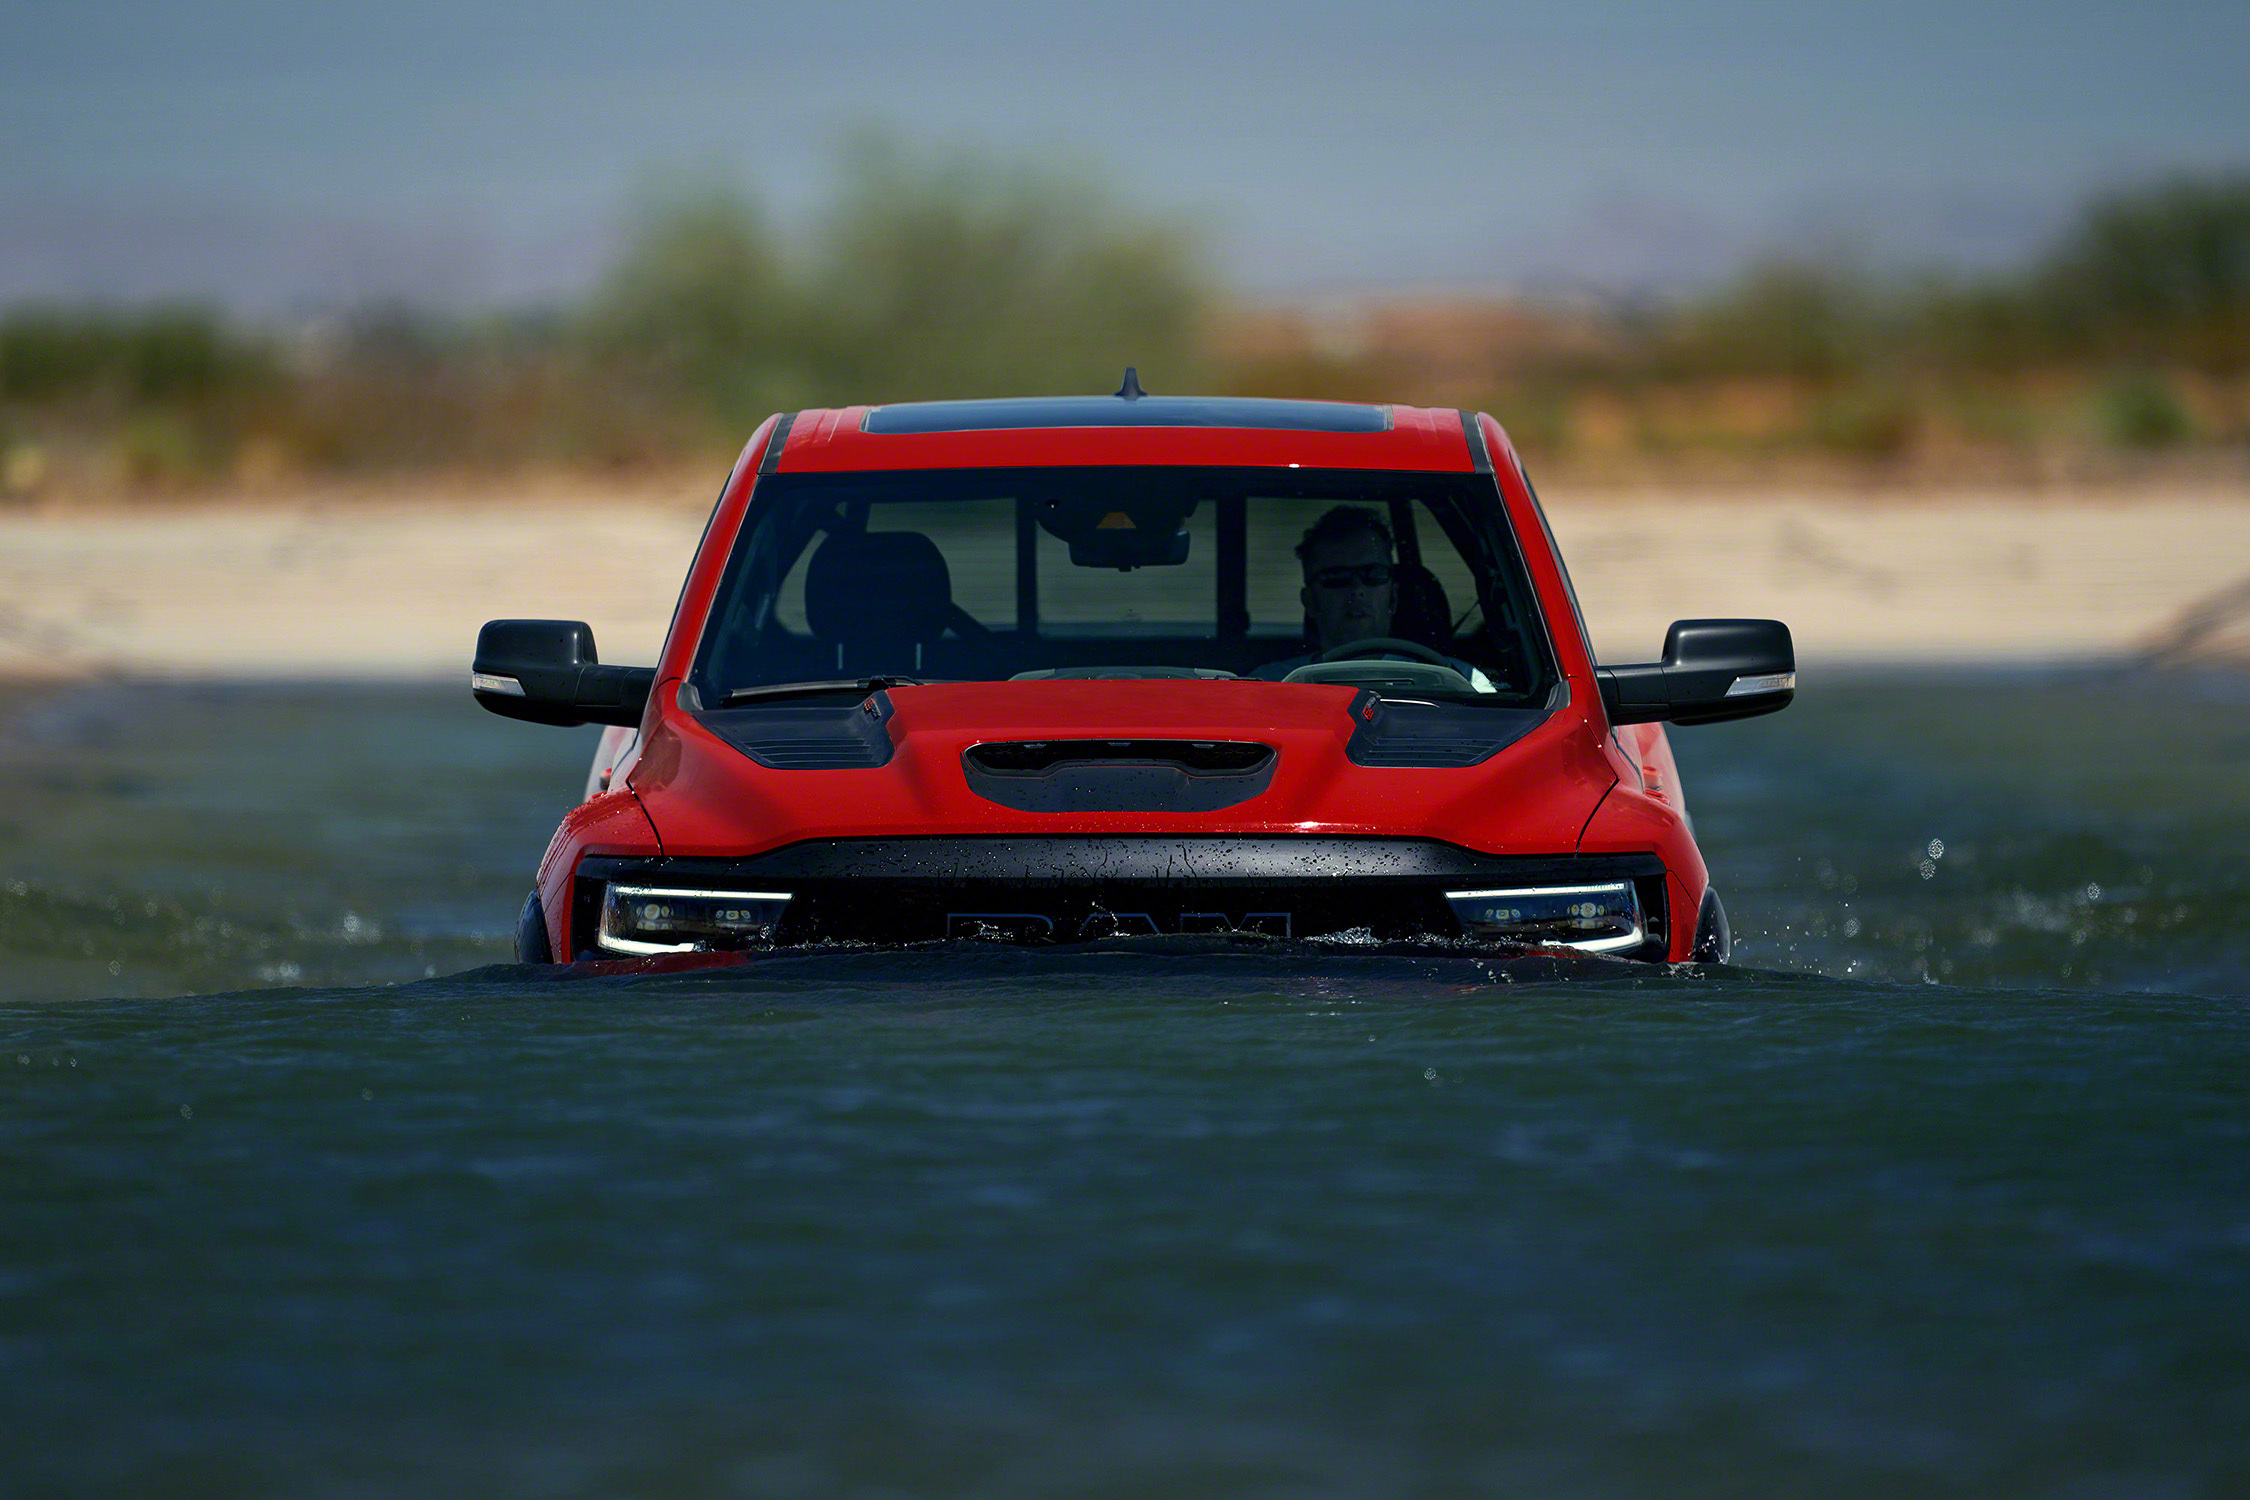 2021 Ram 1500 TRX water fording